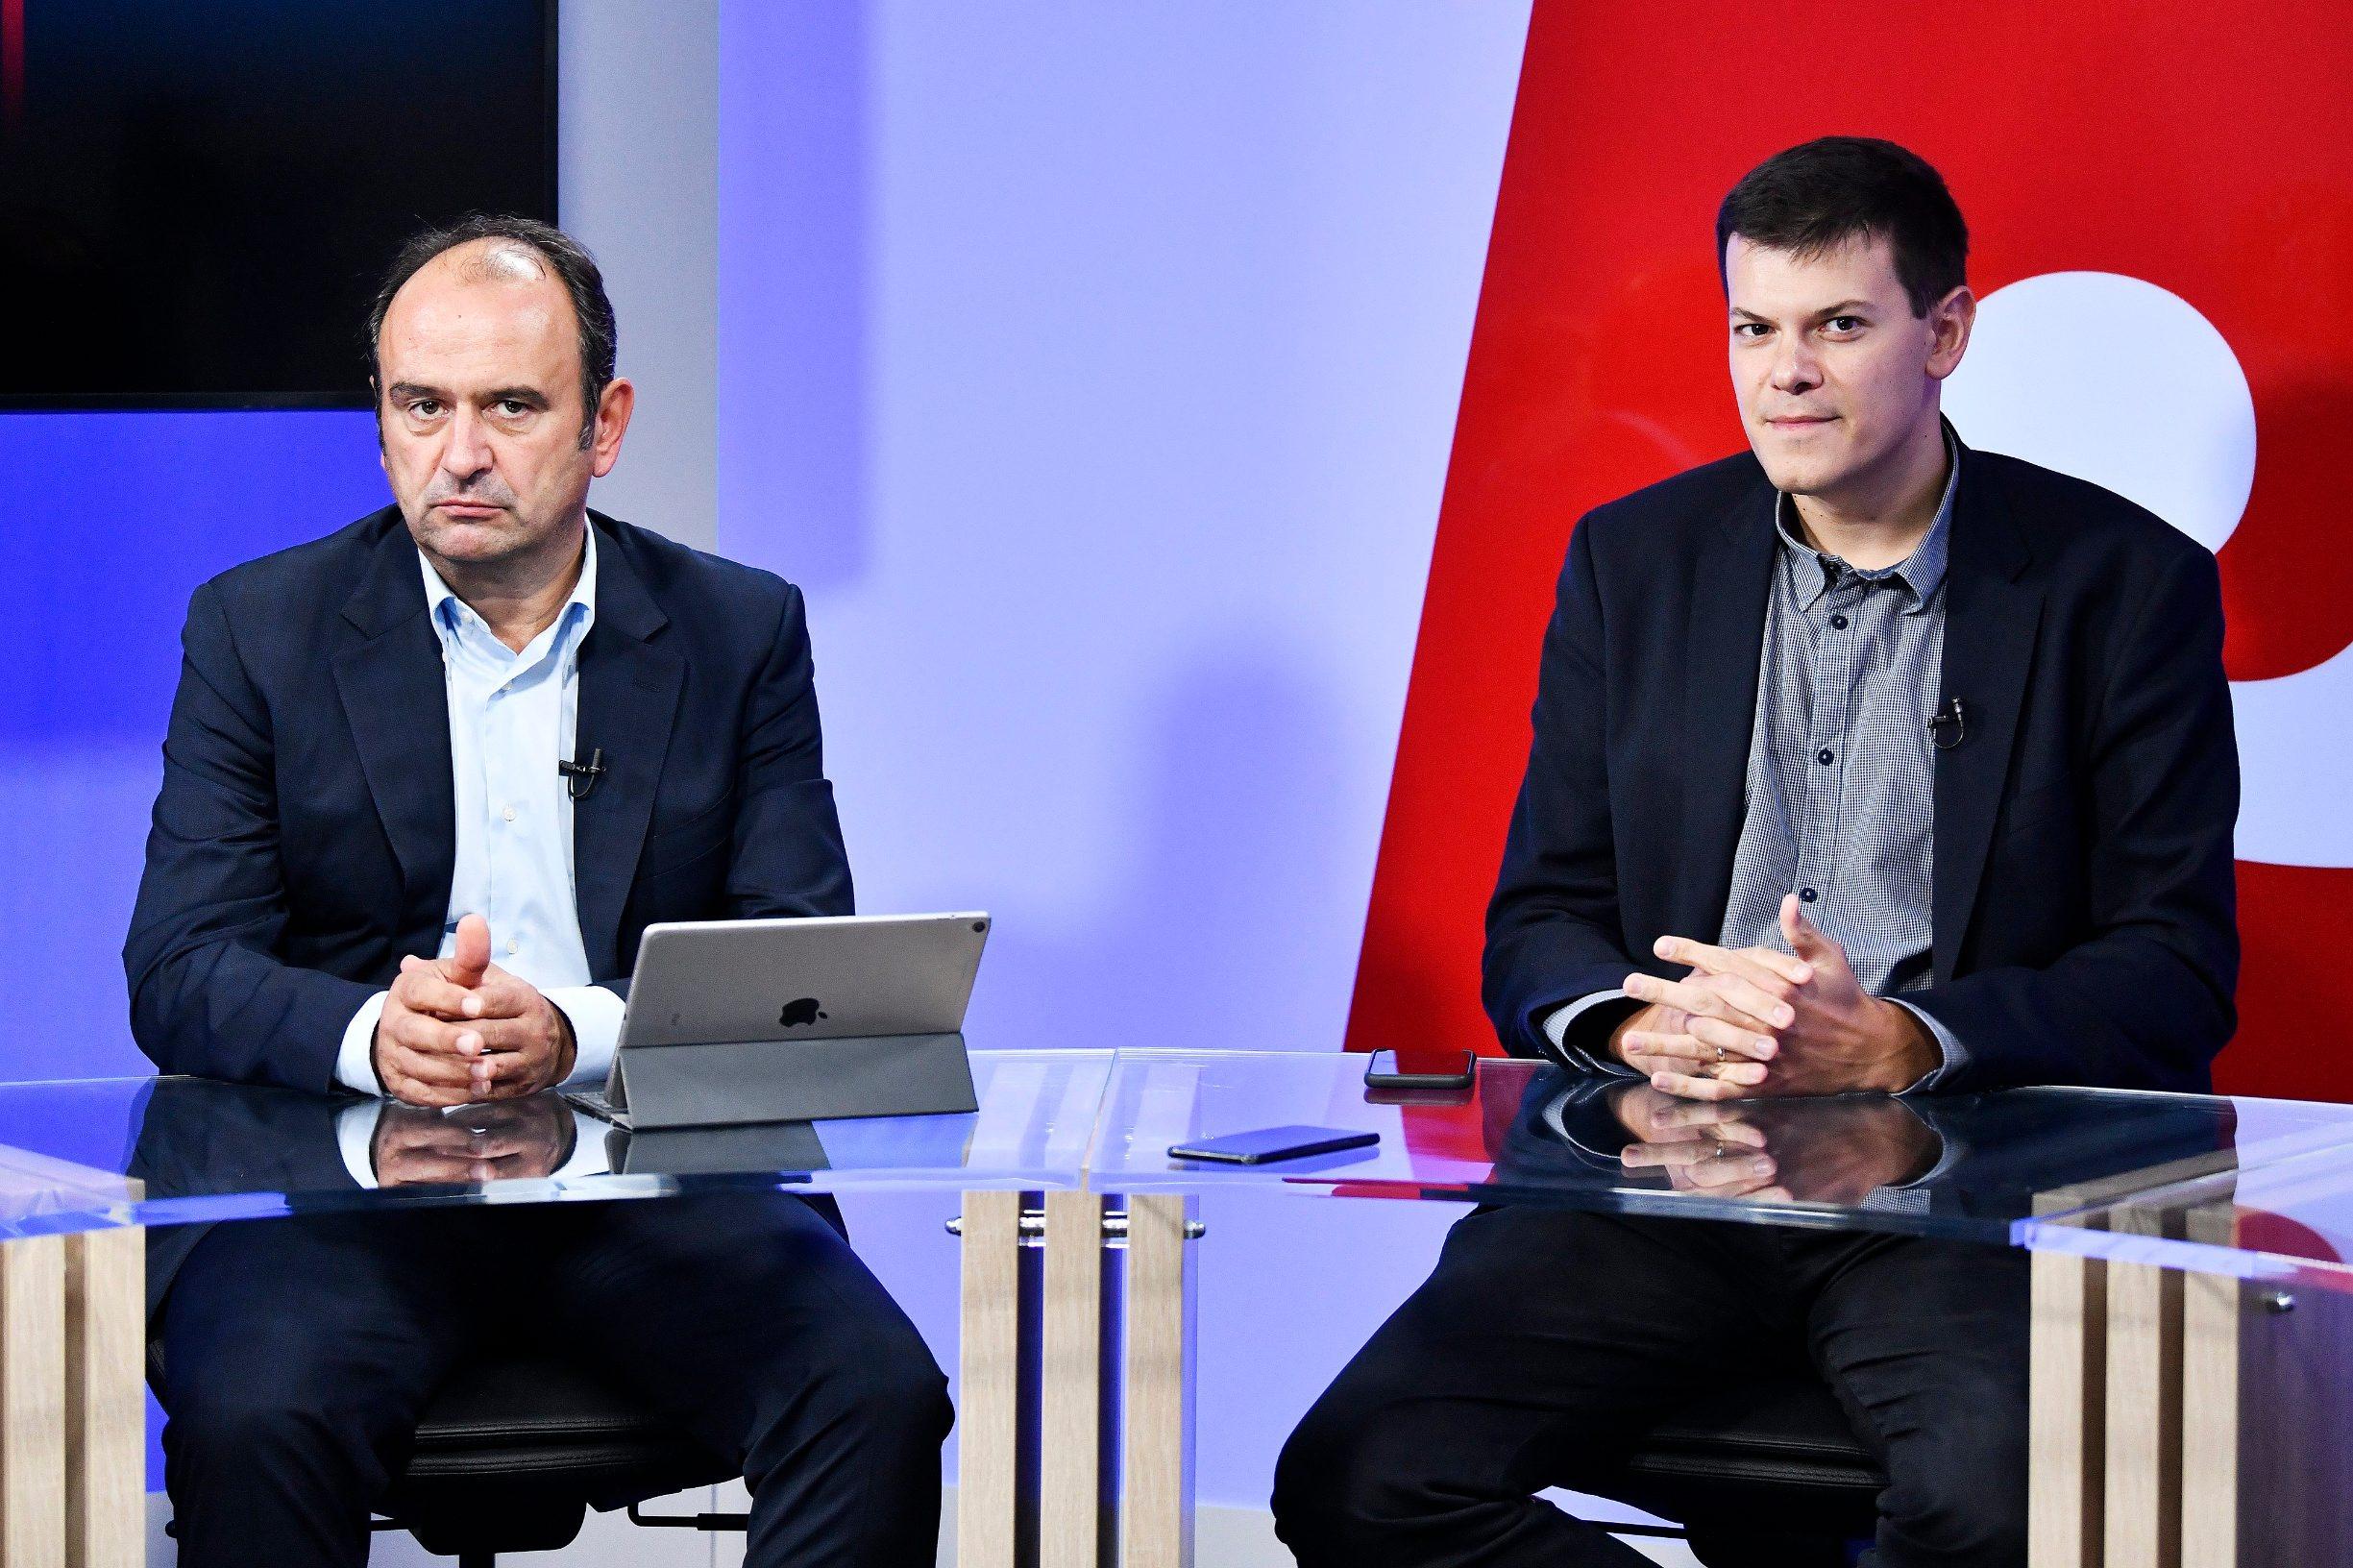 Zagreb, 240920. Okrugli stol o poslovnoj klimi i investicijama u studiju Hanza medie. Na fotografiji: Marinko Dosen i Vuk Vukovic. Boris Kovacev / CROPIX